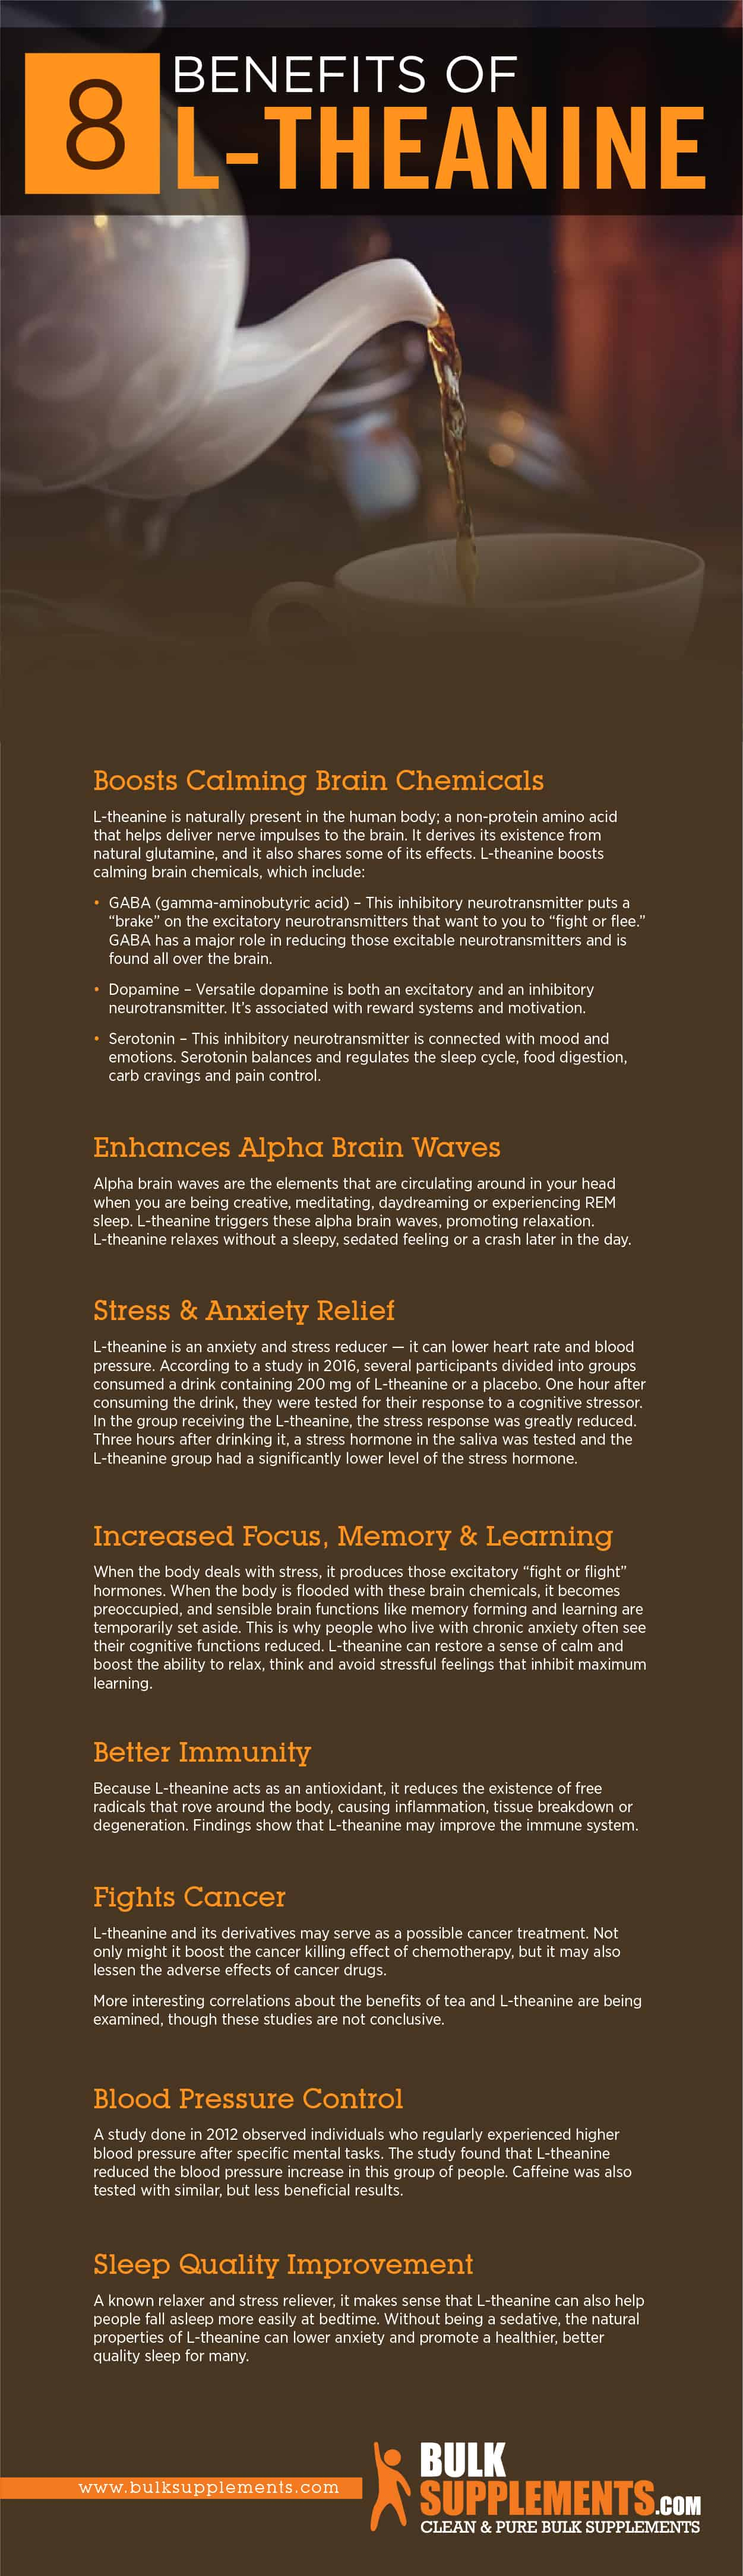 L-Theanine Benefits